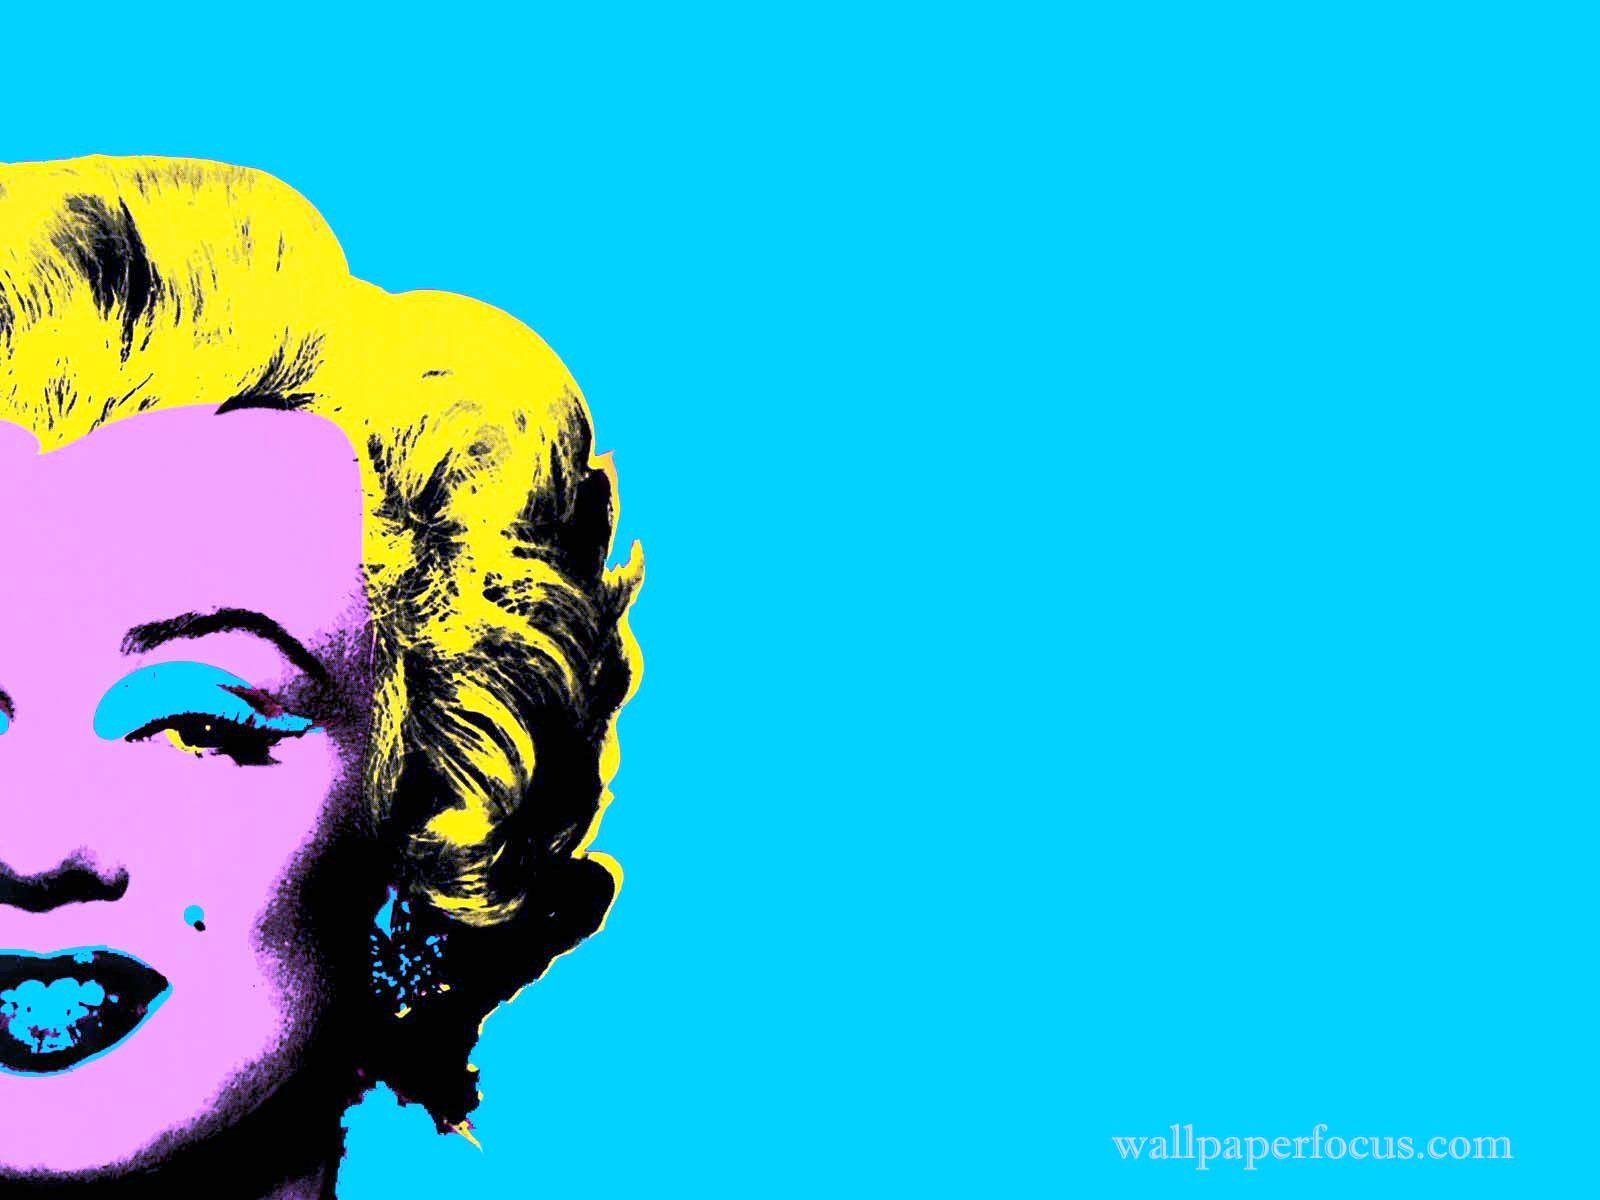 Pop Art Andy Warhol Wallpaper Backgrounds A Pinterest HD Wallpapers Download Free Images Wallpaper [1000image.com]